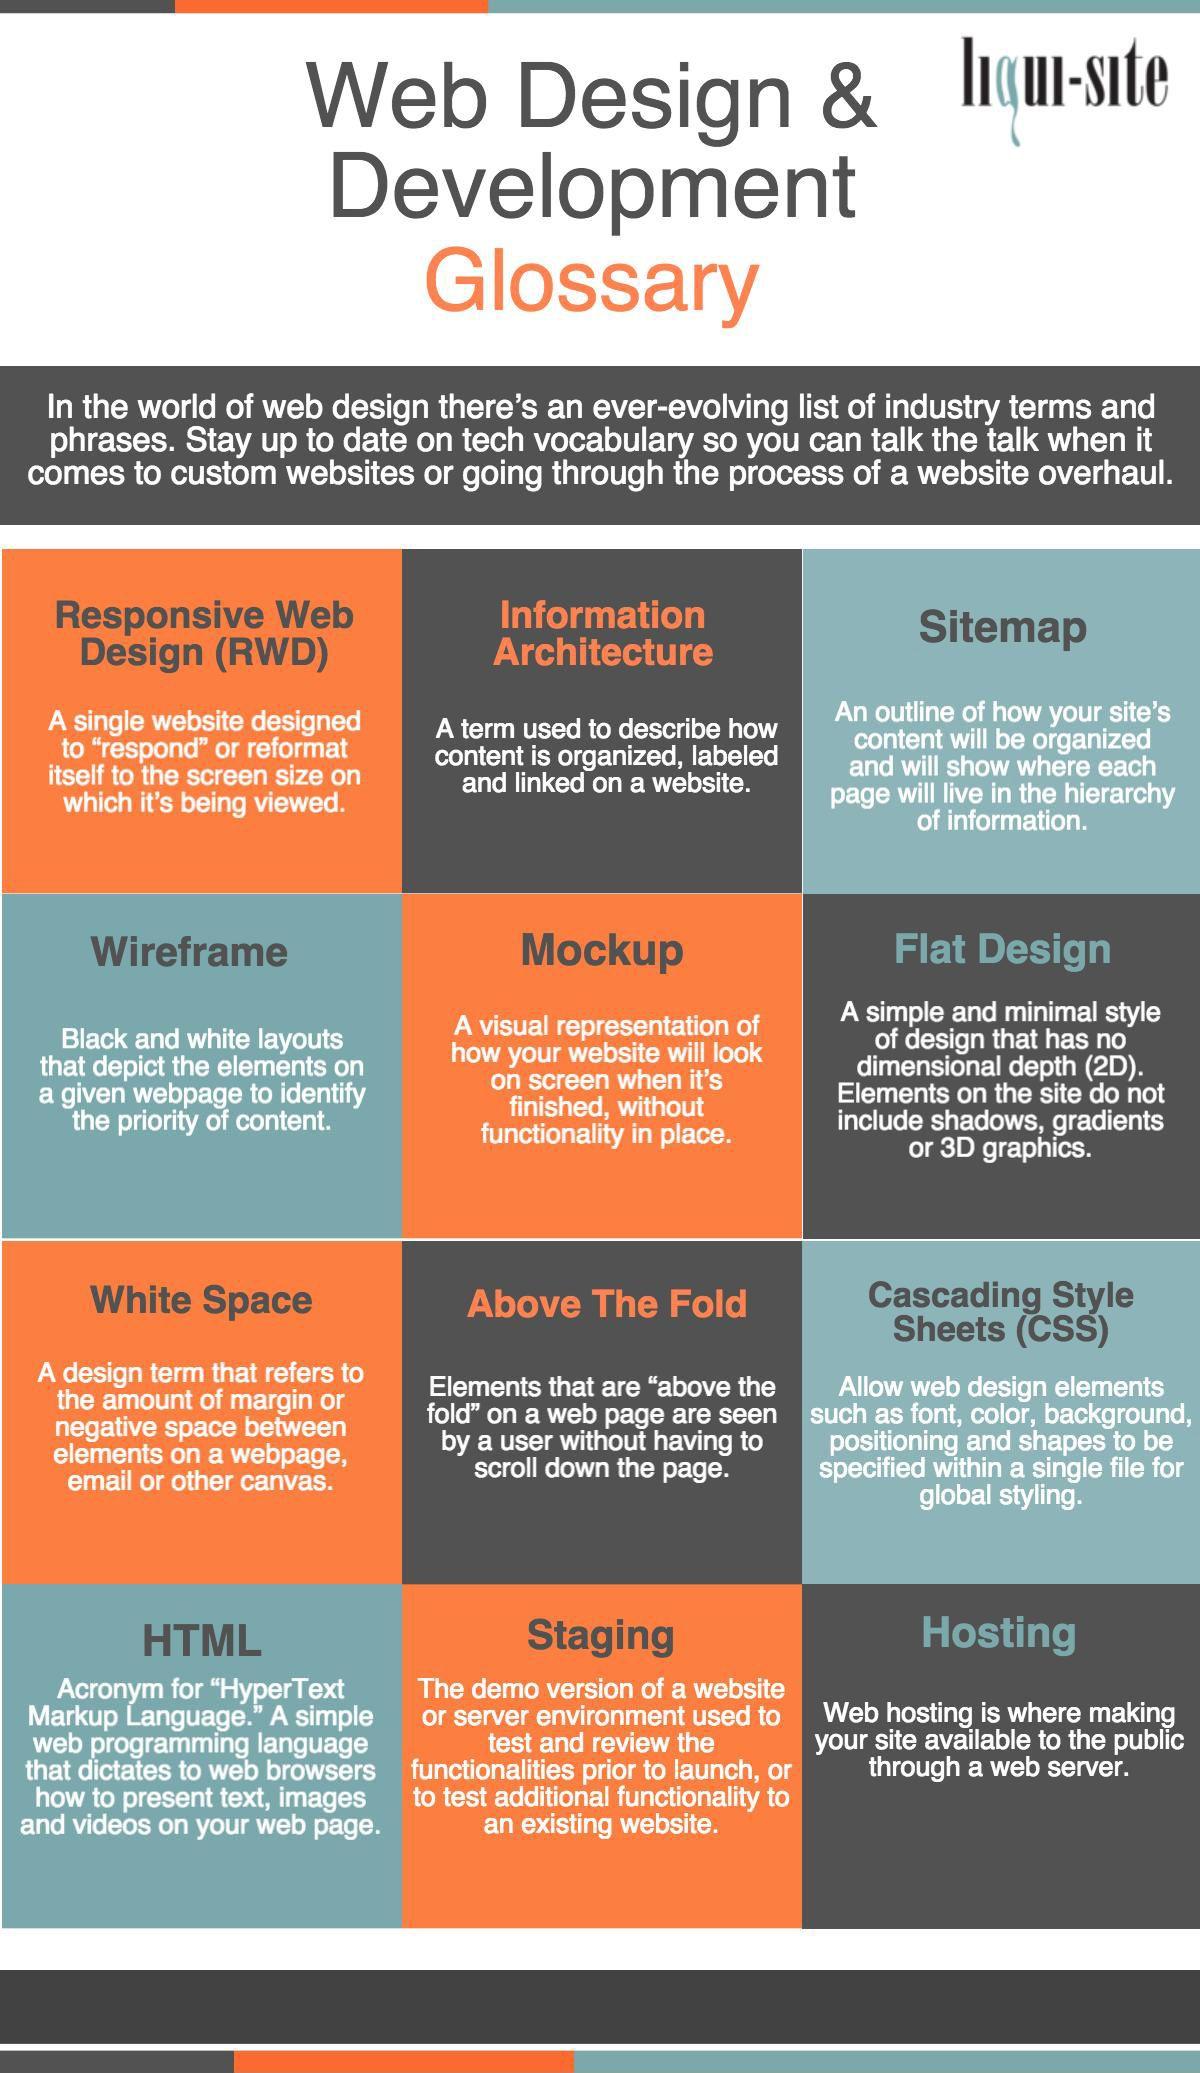 Web Design Development Glossary Infographic Webdesign Webdevelopment Glossary Web Development Design Web Design Custom Web Design